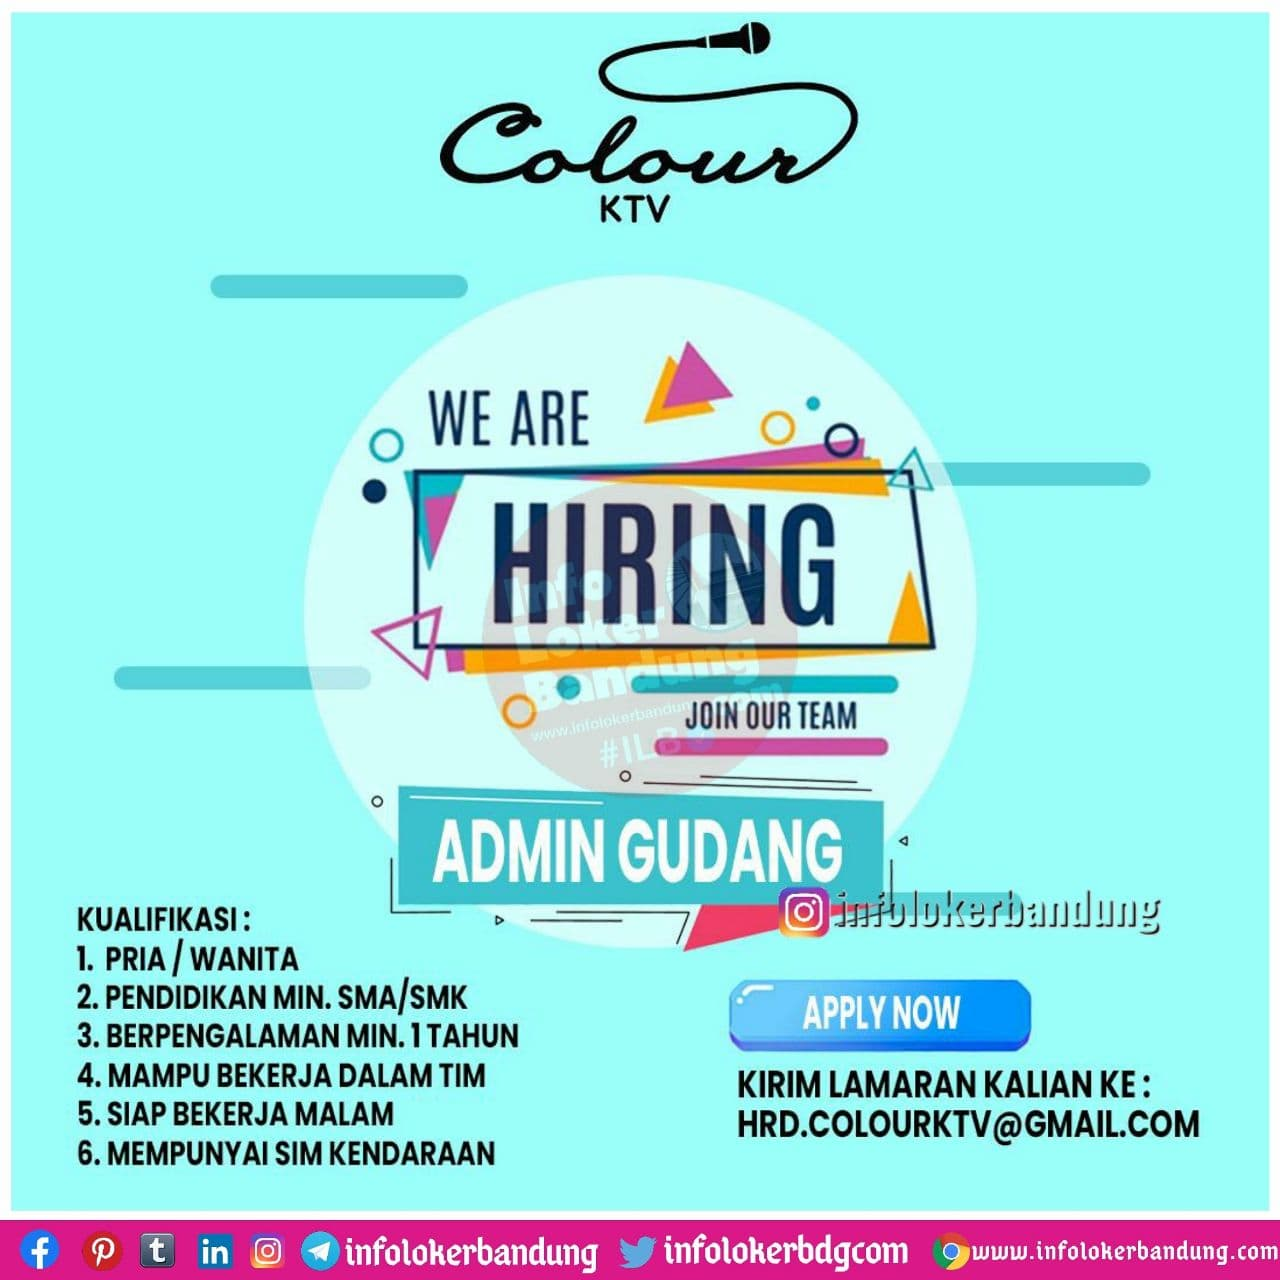 Lowongan Kerja Colour KTV Bandung Desember 2020